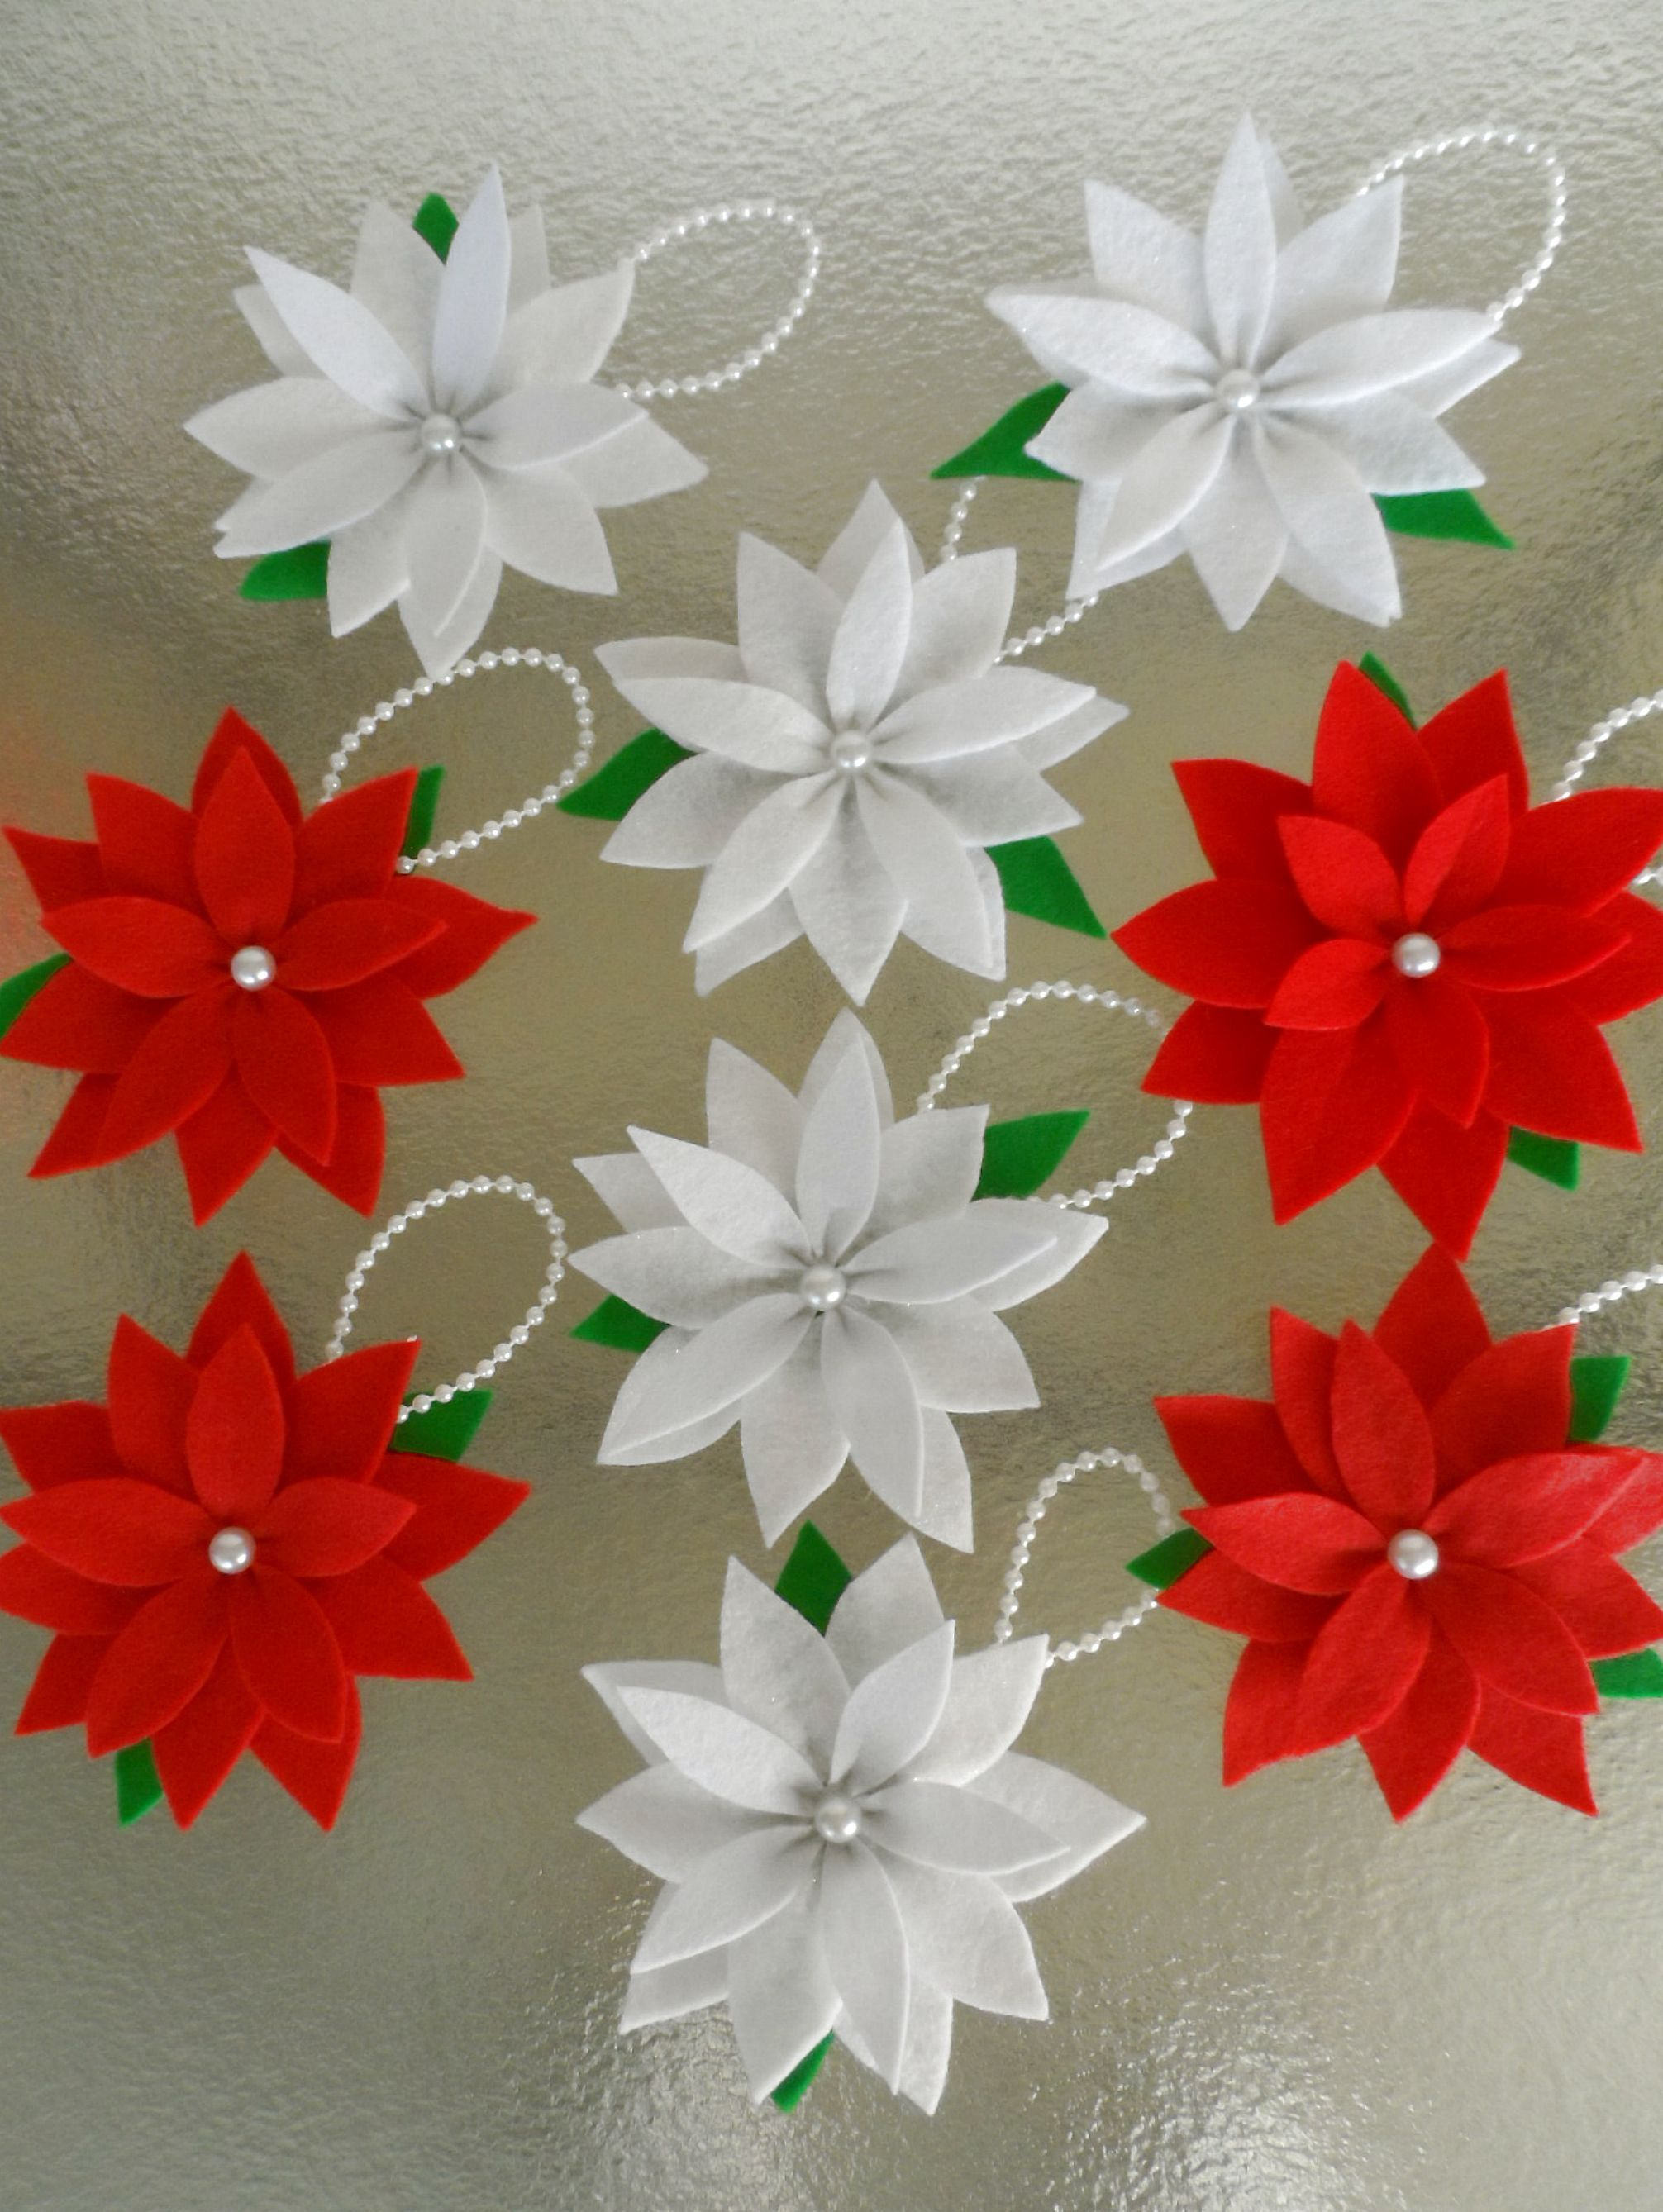 Poinsettia Christmas Ornaments 9 Pack Set Felt Flowers Christmas Floral White Christmas Decor